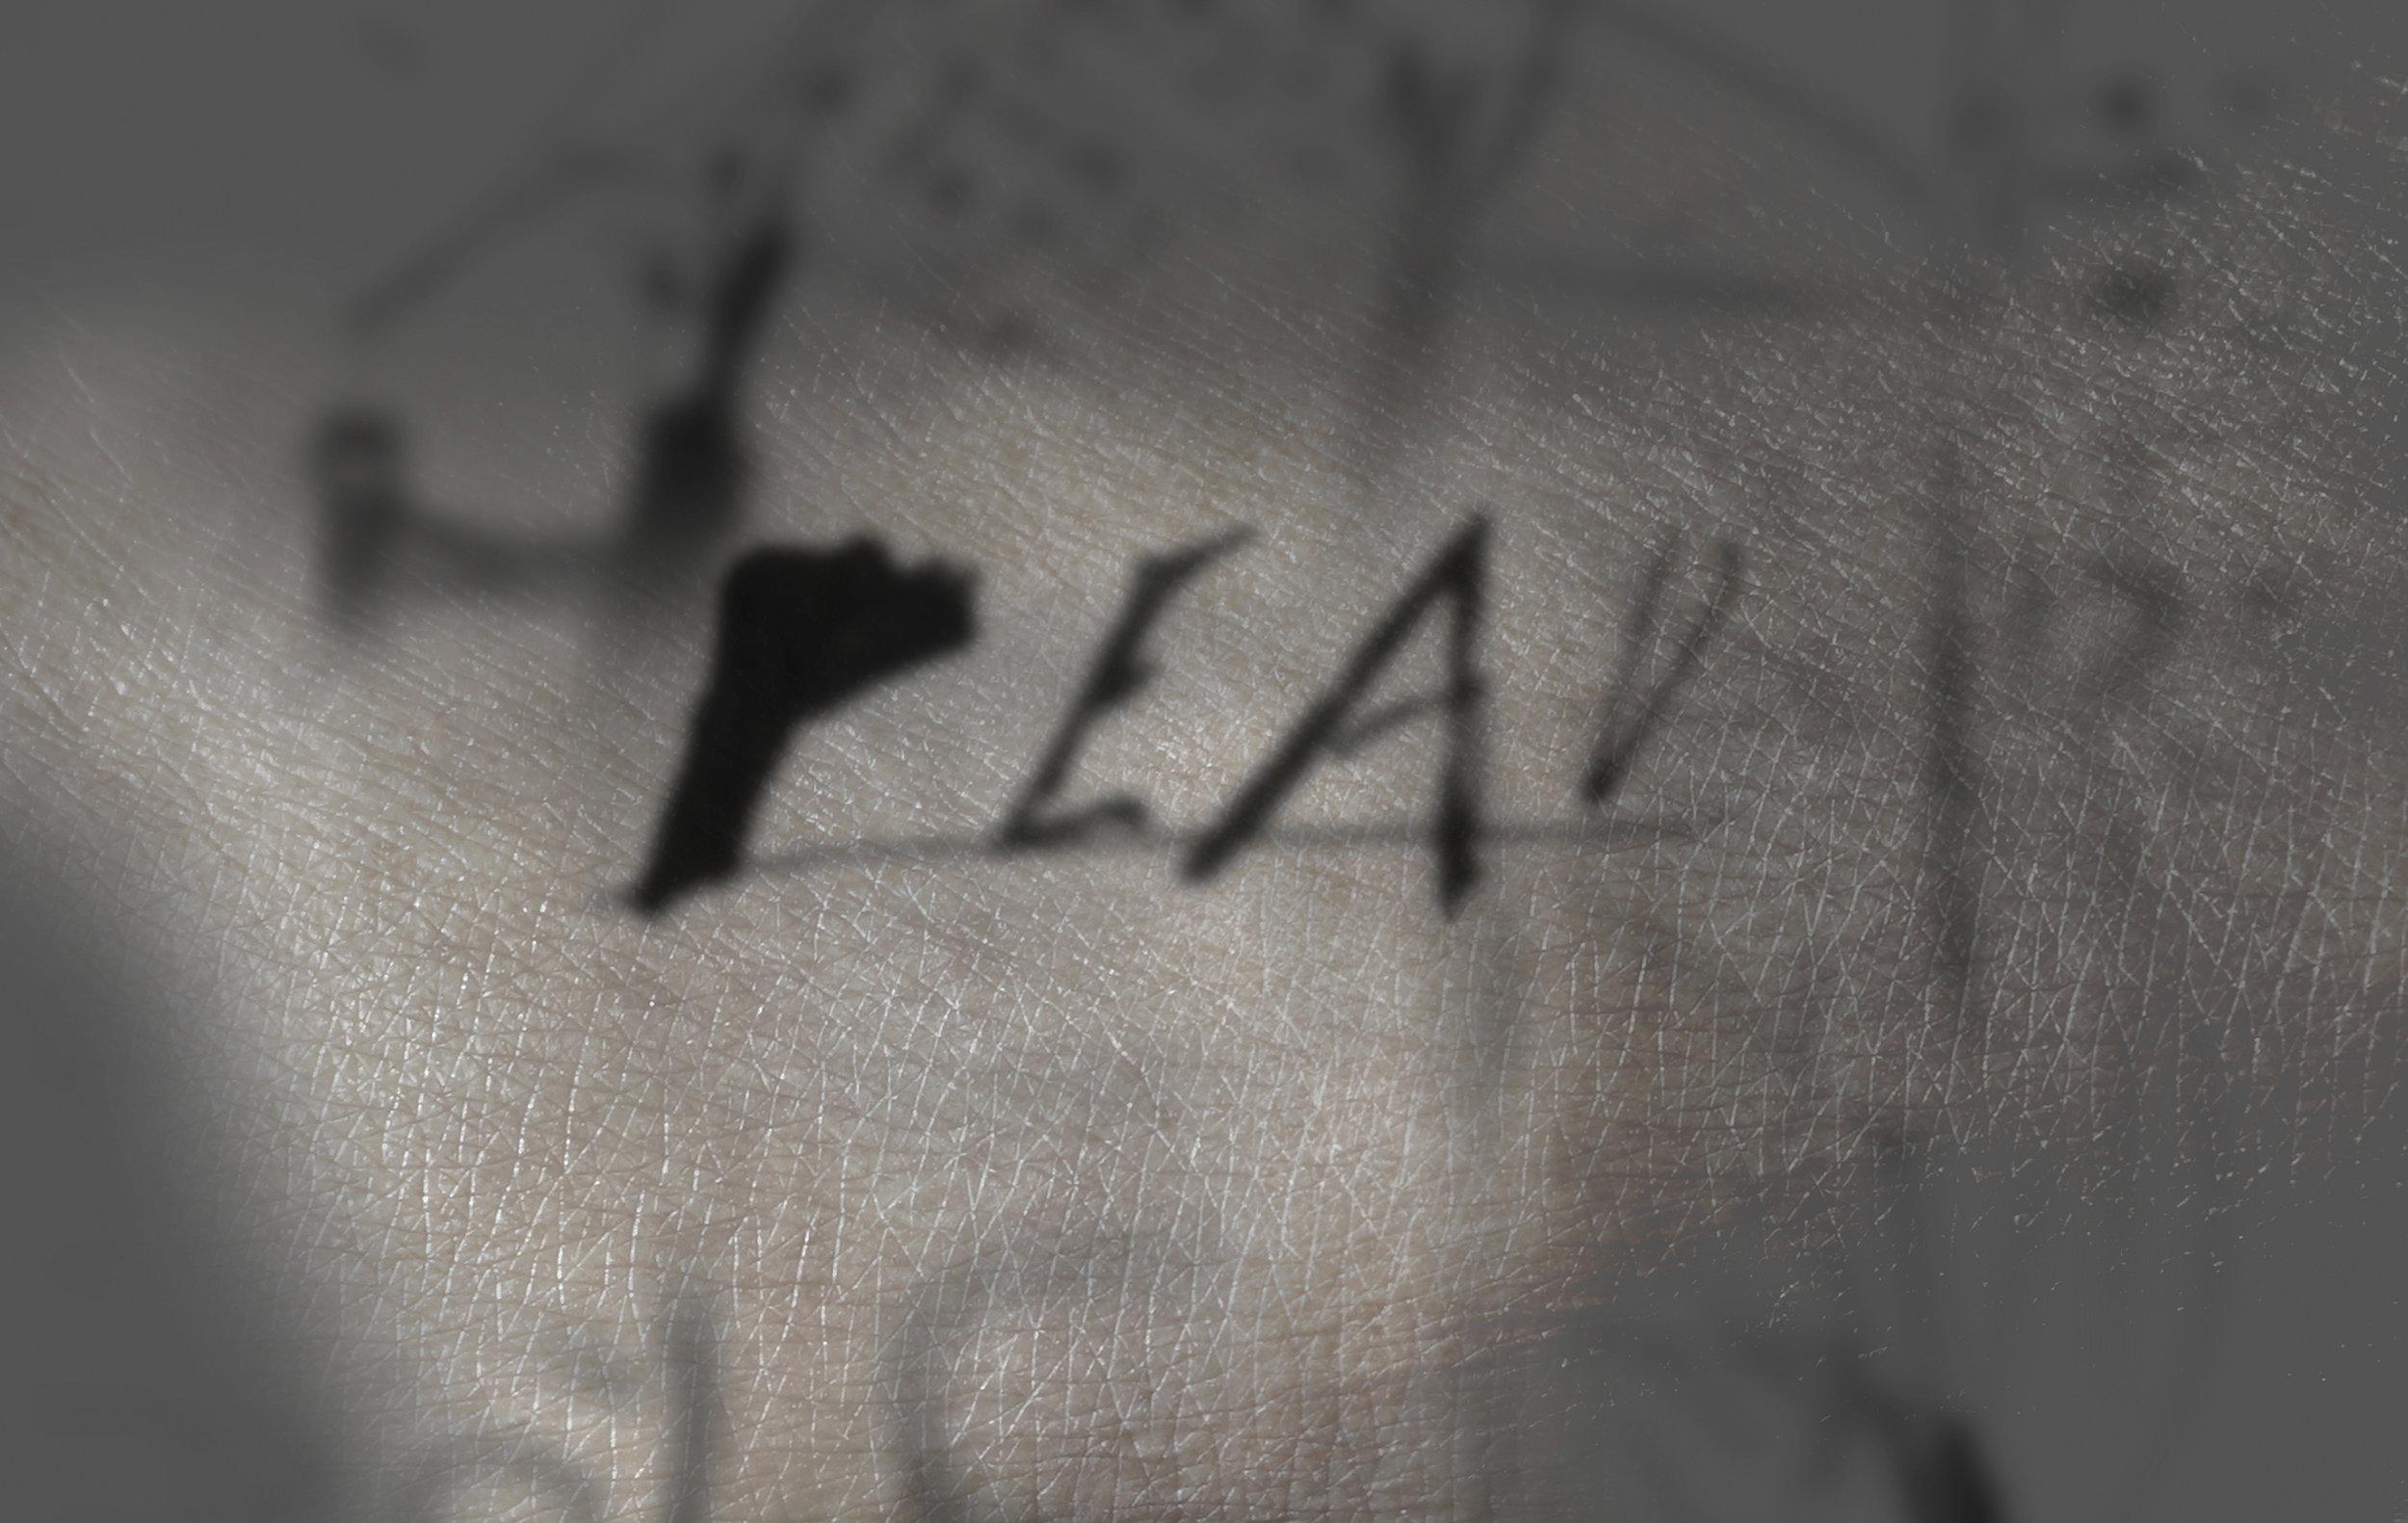 3.im5_11.jpg